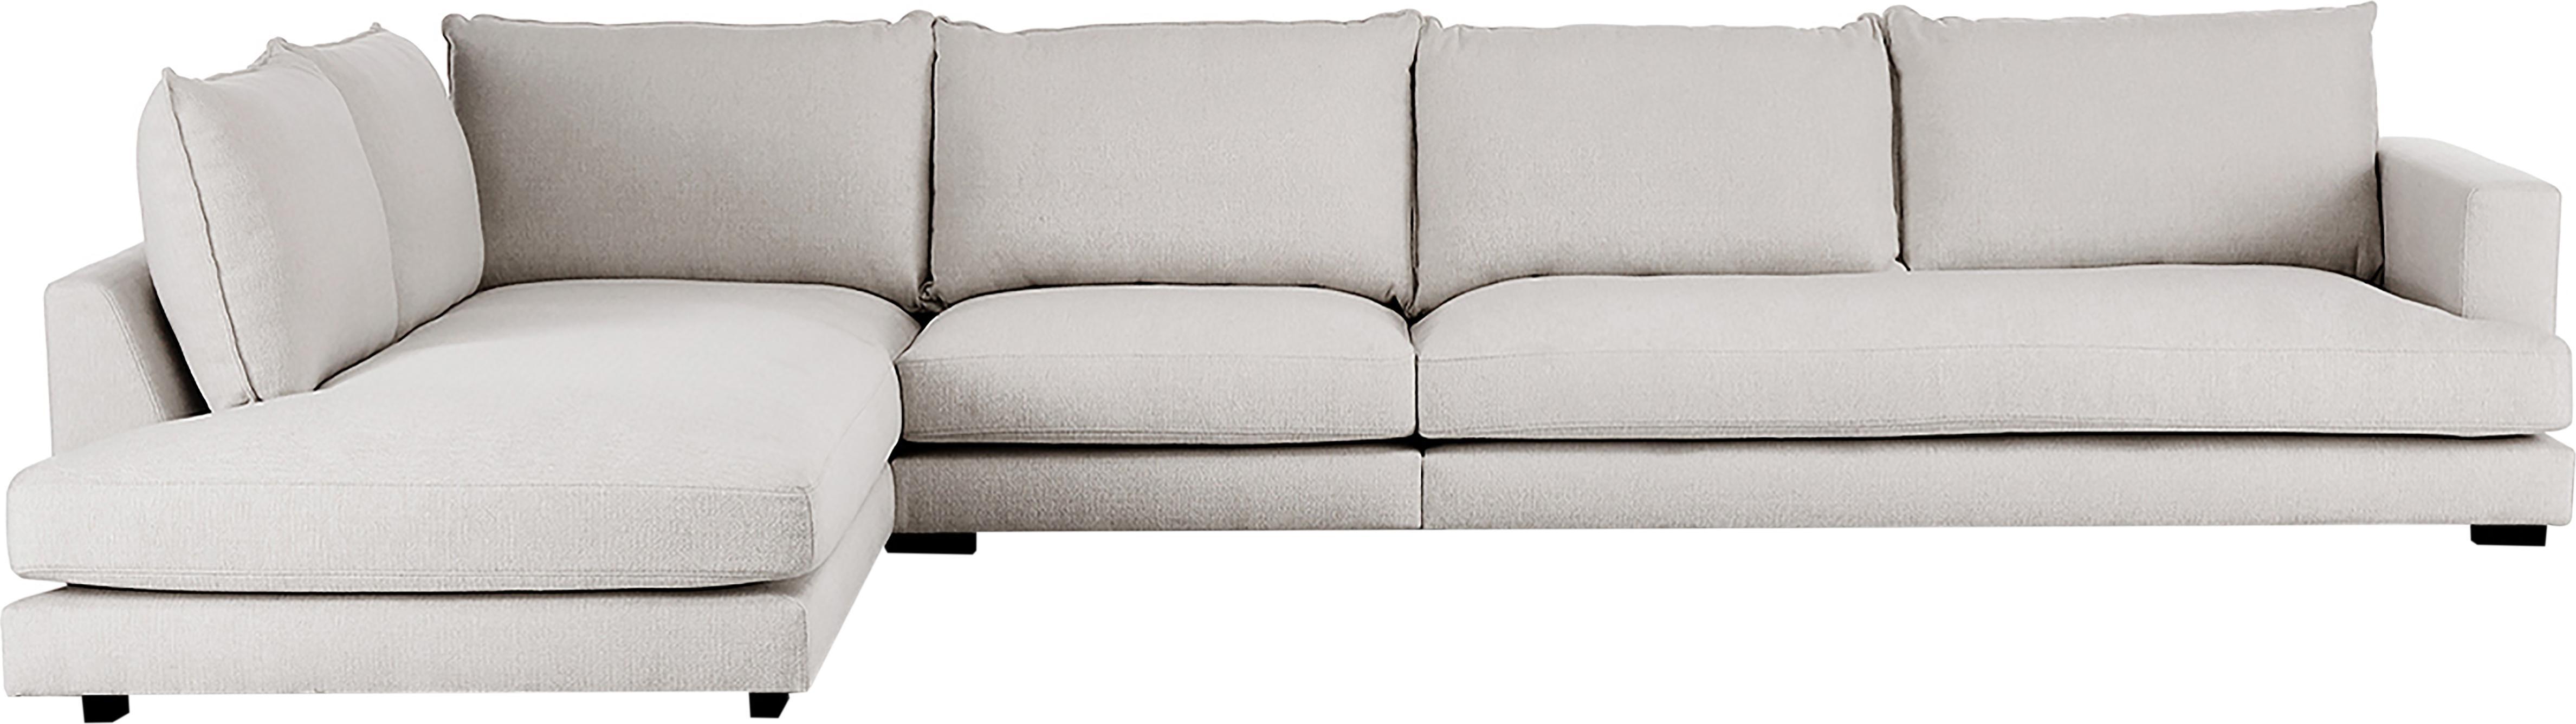 XL-Ecksofa Tribeca, Bezug: Polyester Der hochwertige, Gestell: Massives Kiefernholz, Webstoff Beigegrau, B 405 x T 228 cm